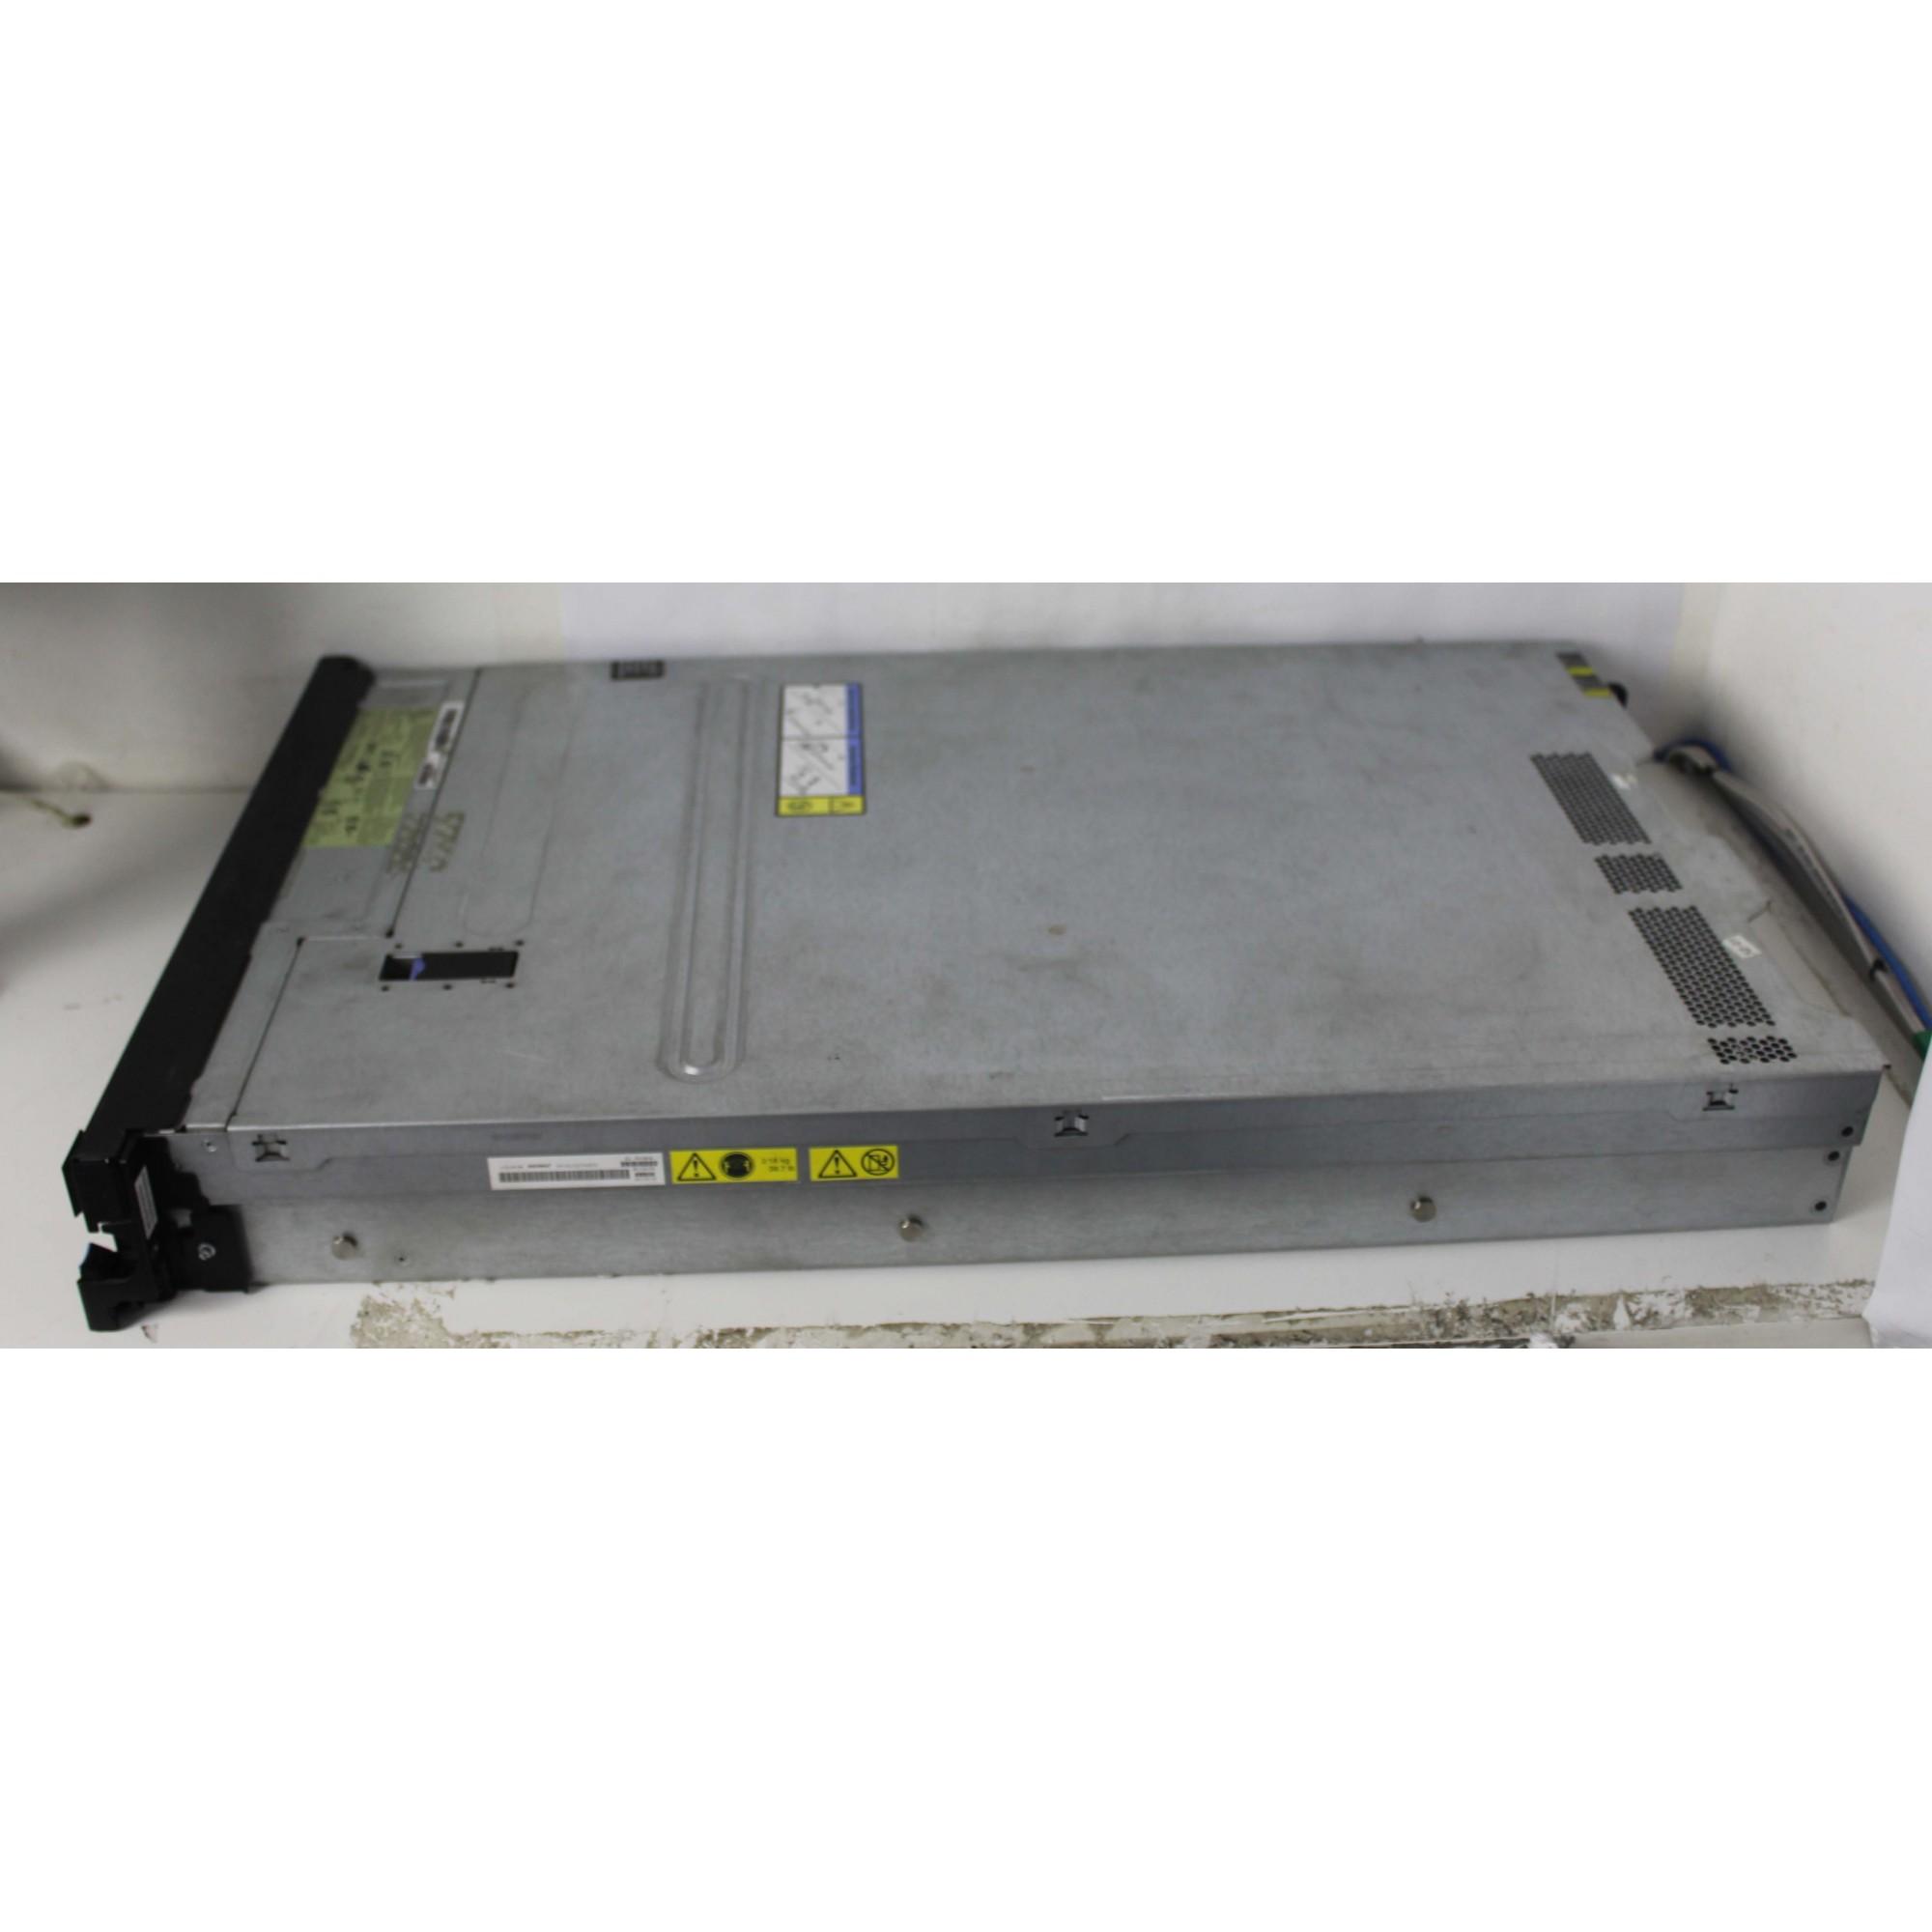 Servidor IBM System x3650 M4 2X Intel Xeon 2.3GHz 128GB 2X HD-300GB